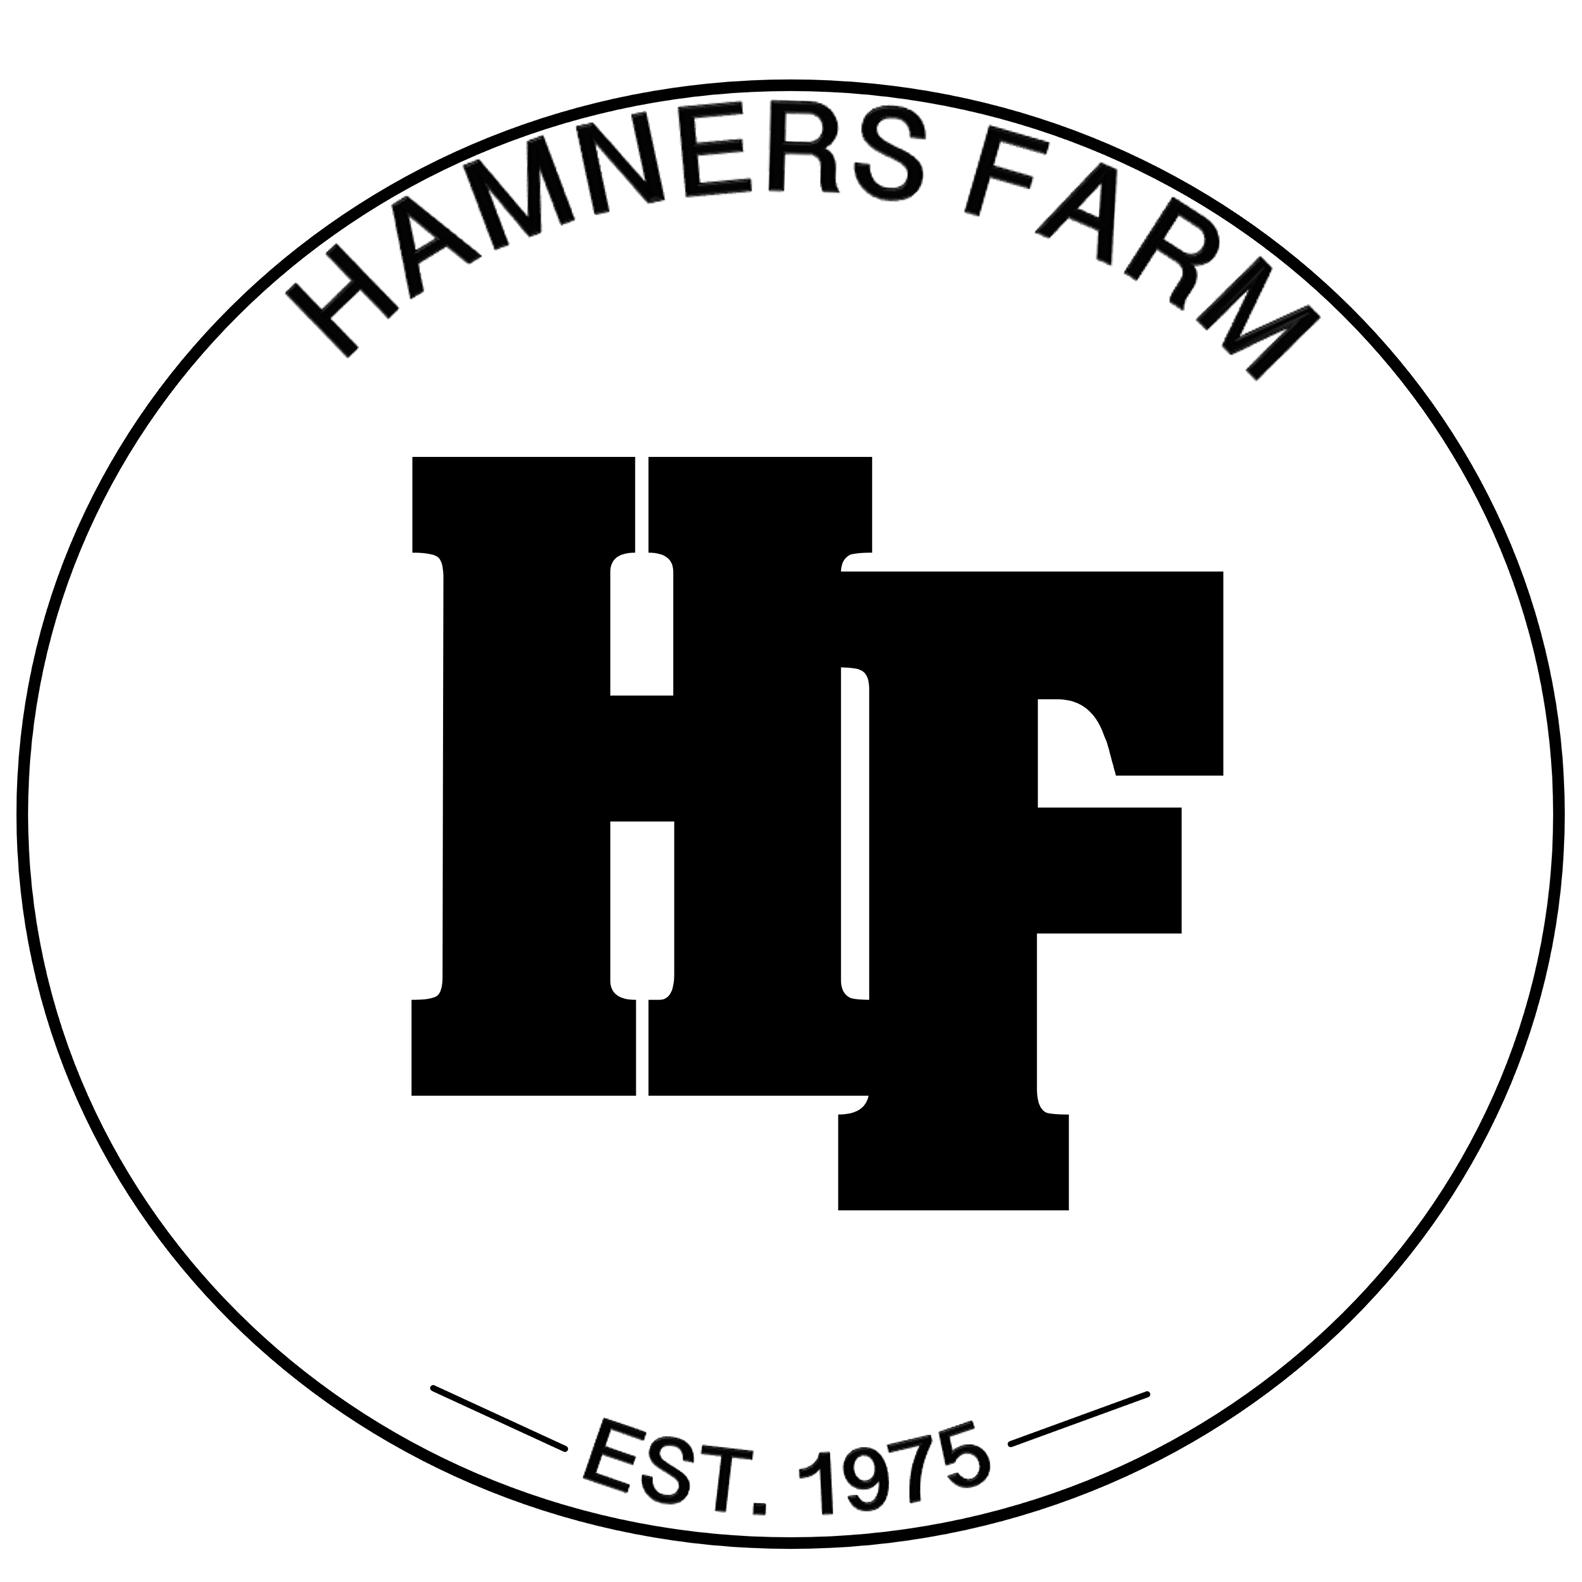 Hamners Farm